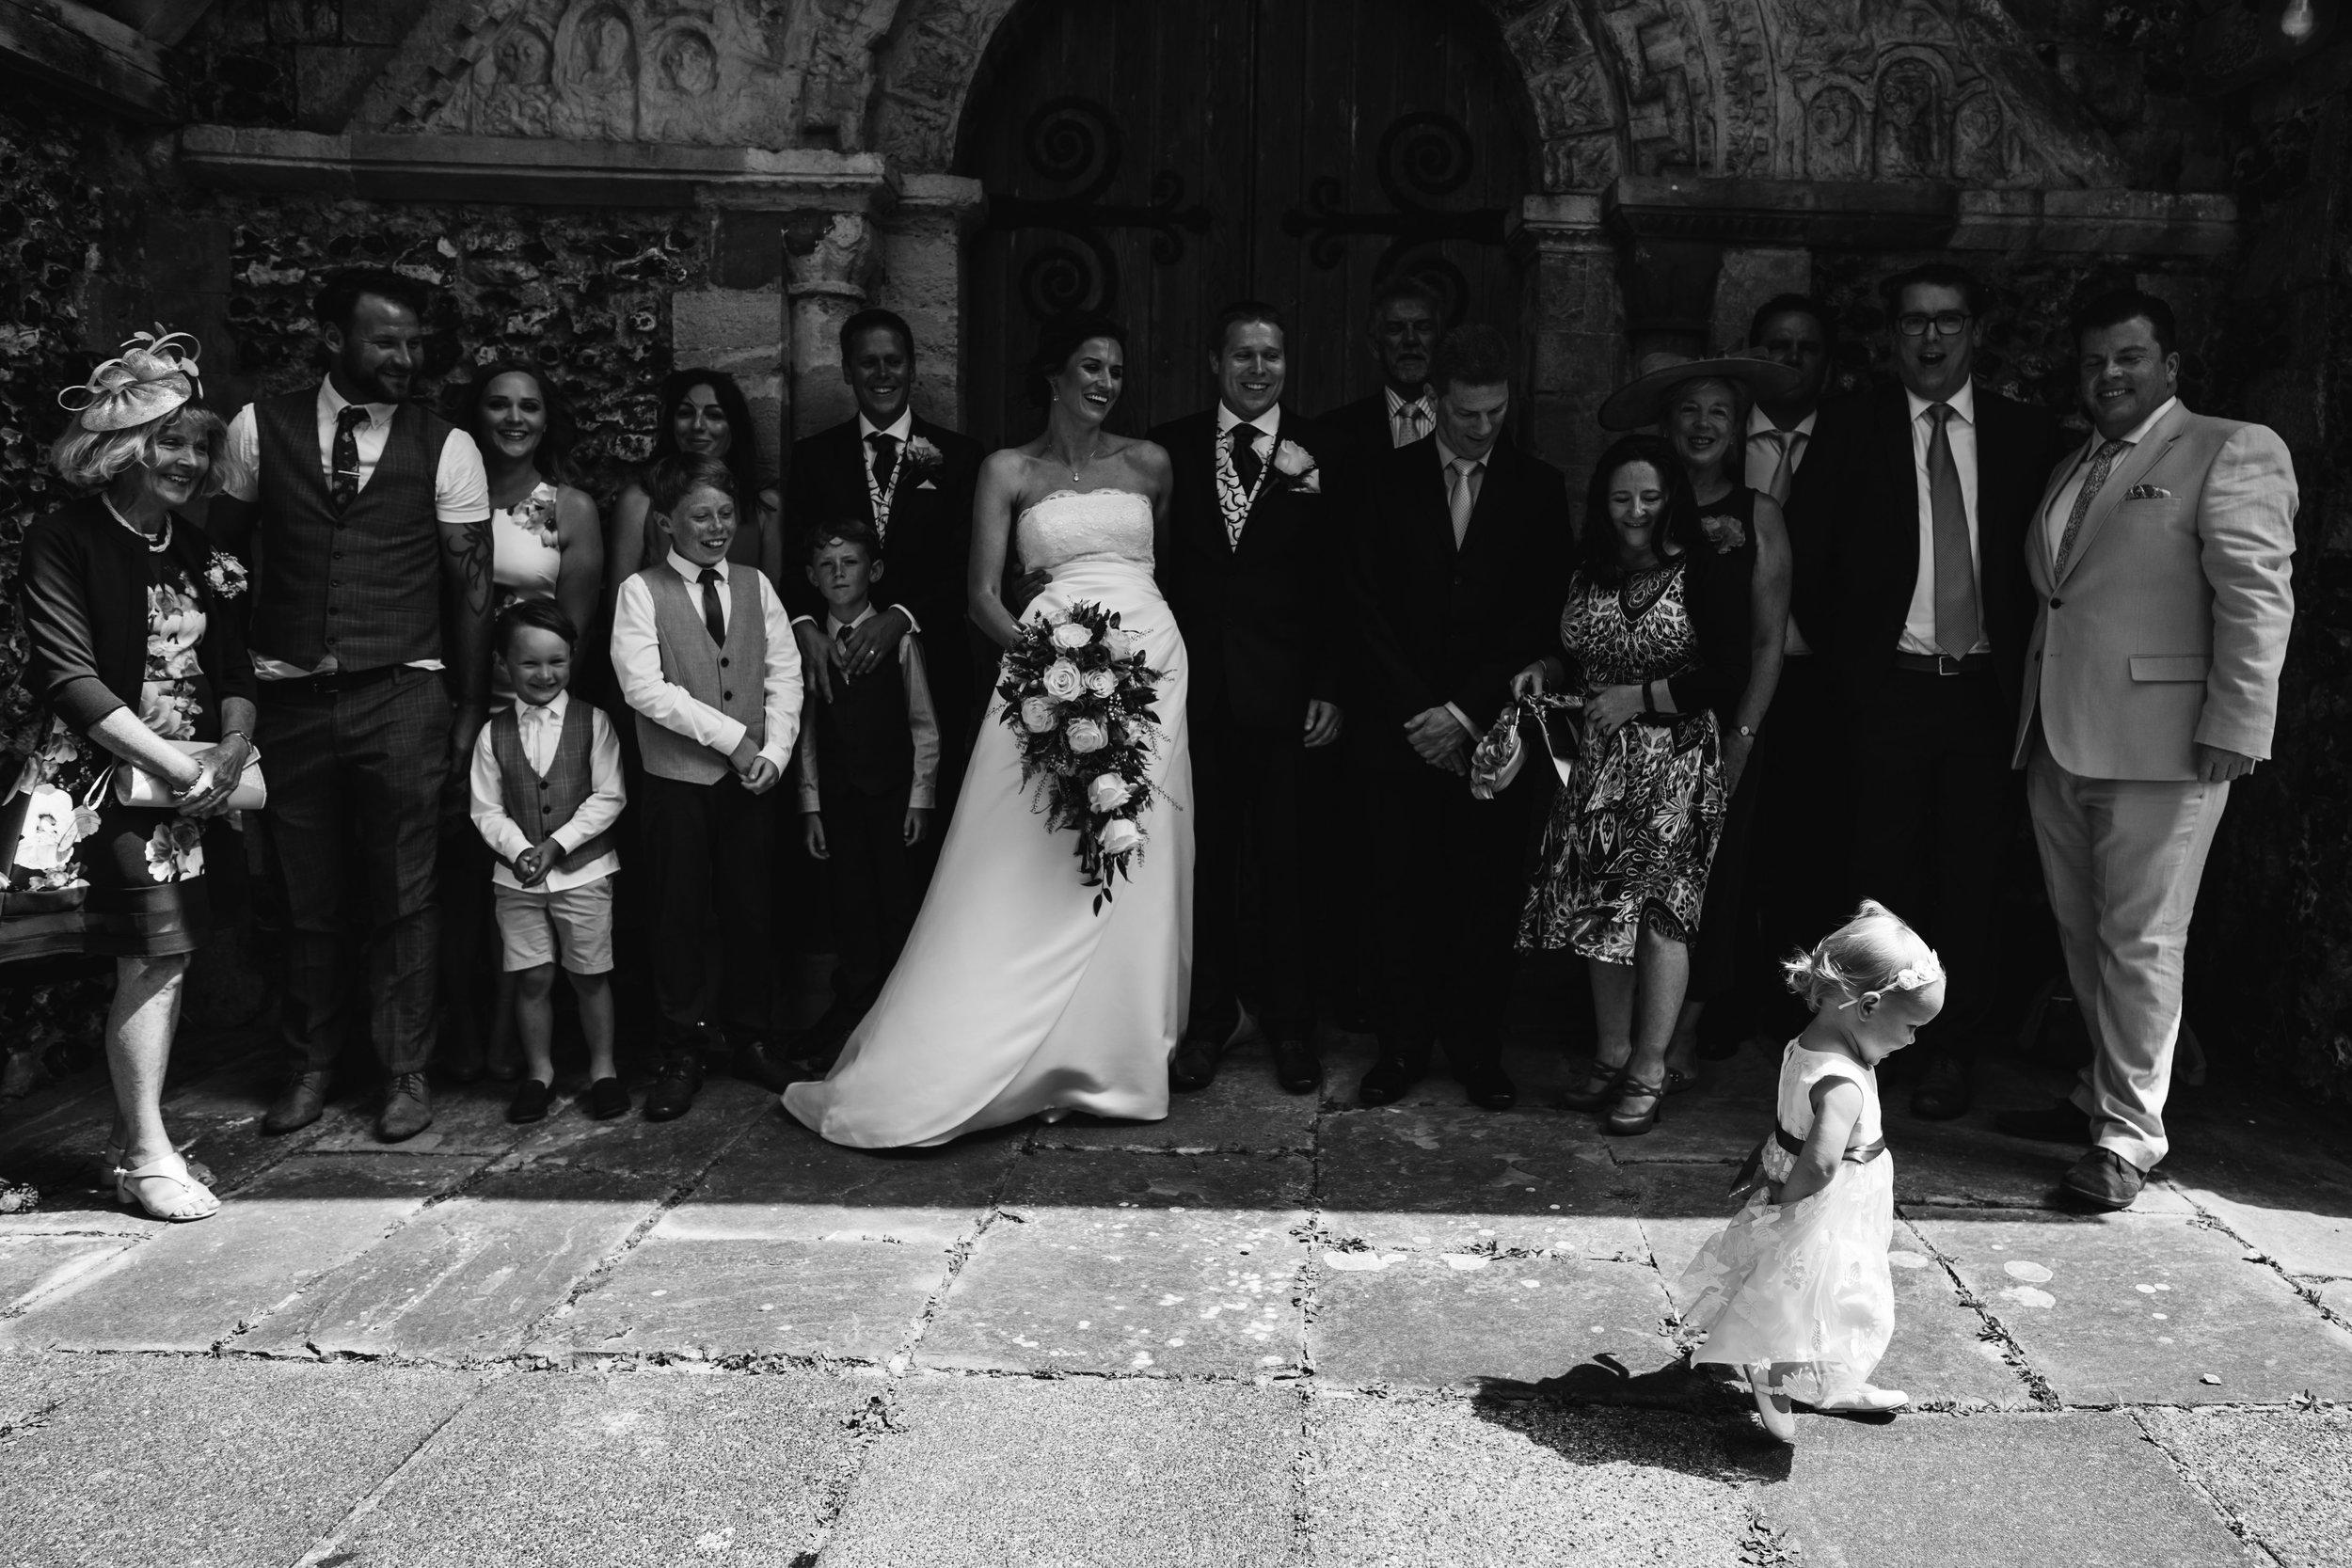 kent-wedding-photographer-02064.jpg